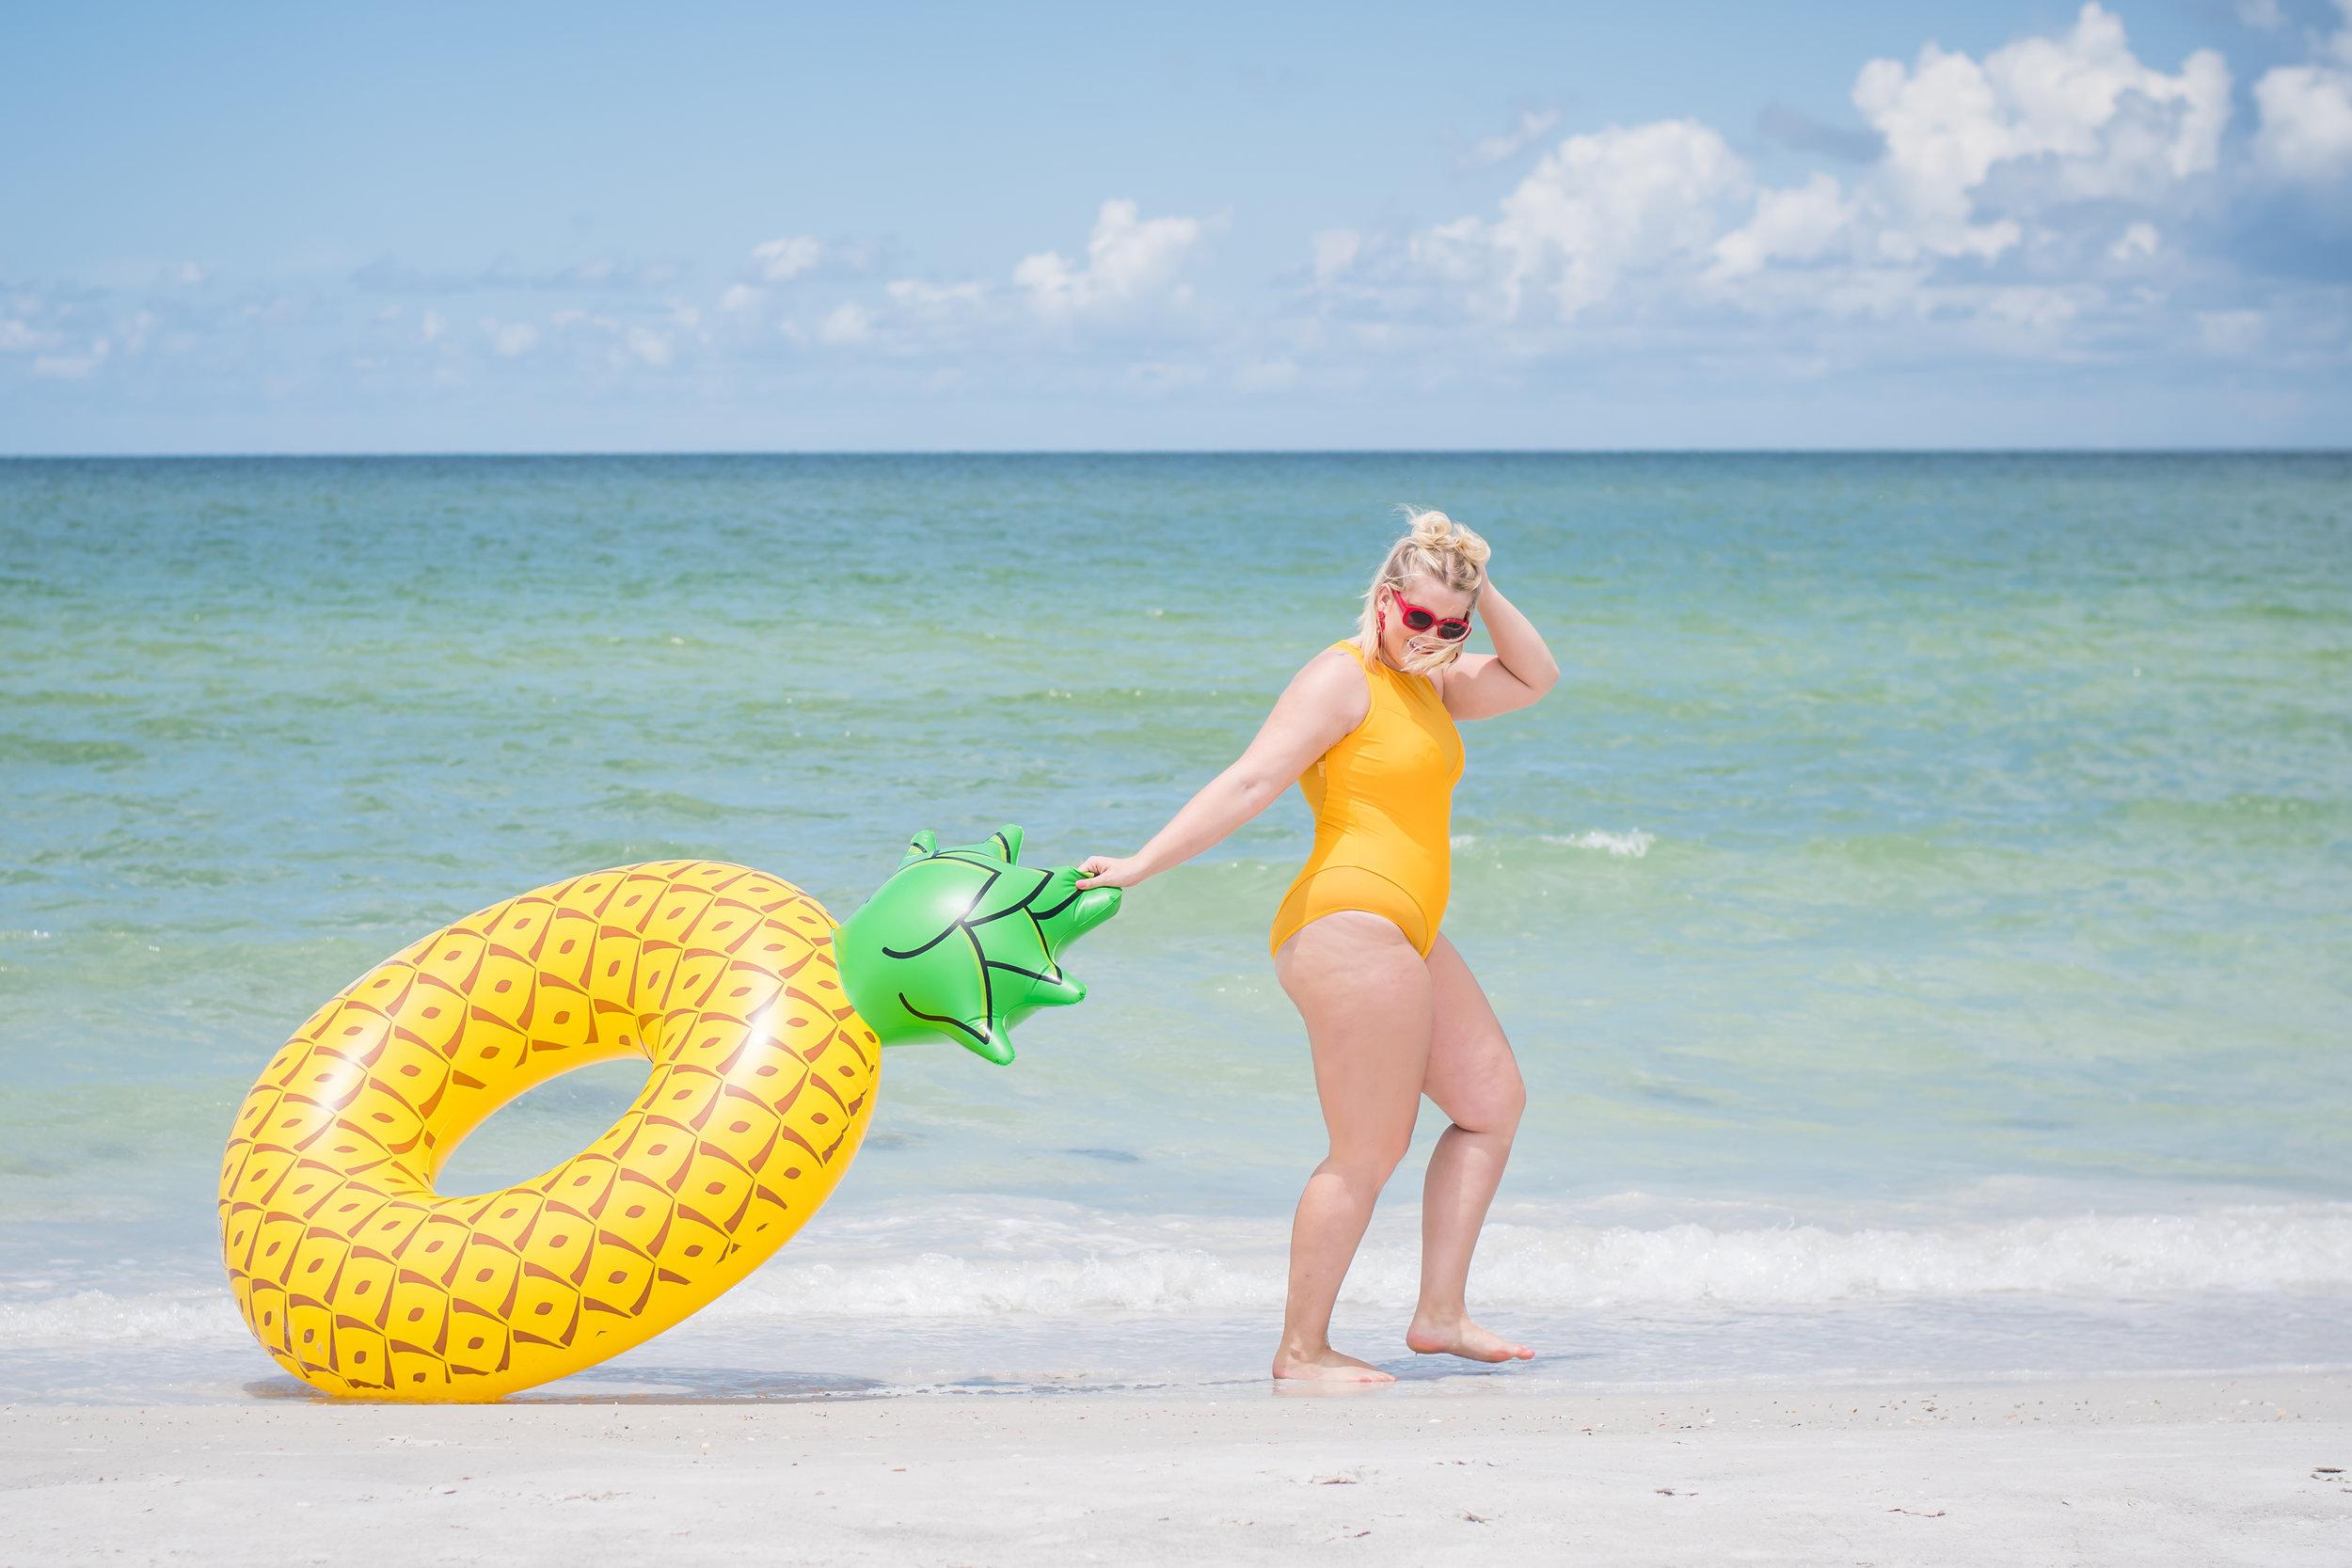 body-positive-model-beach-photoshoot-orlando-photographer-yanitza-ninett-7.jpg